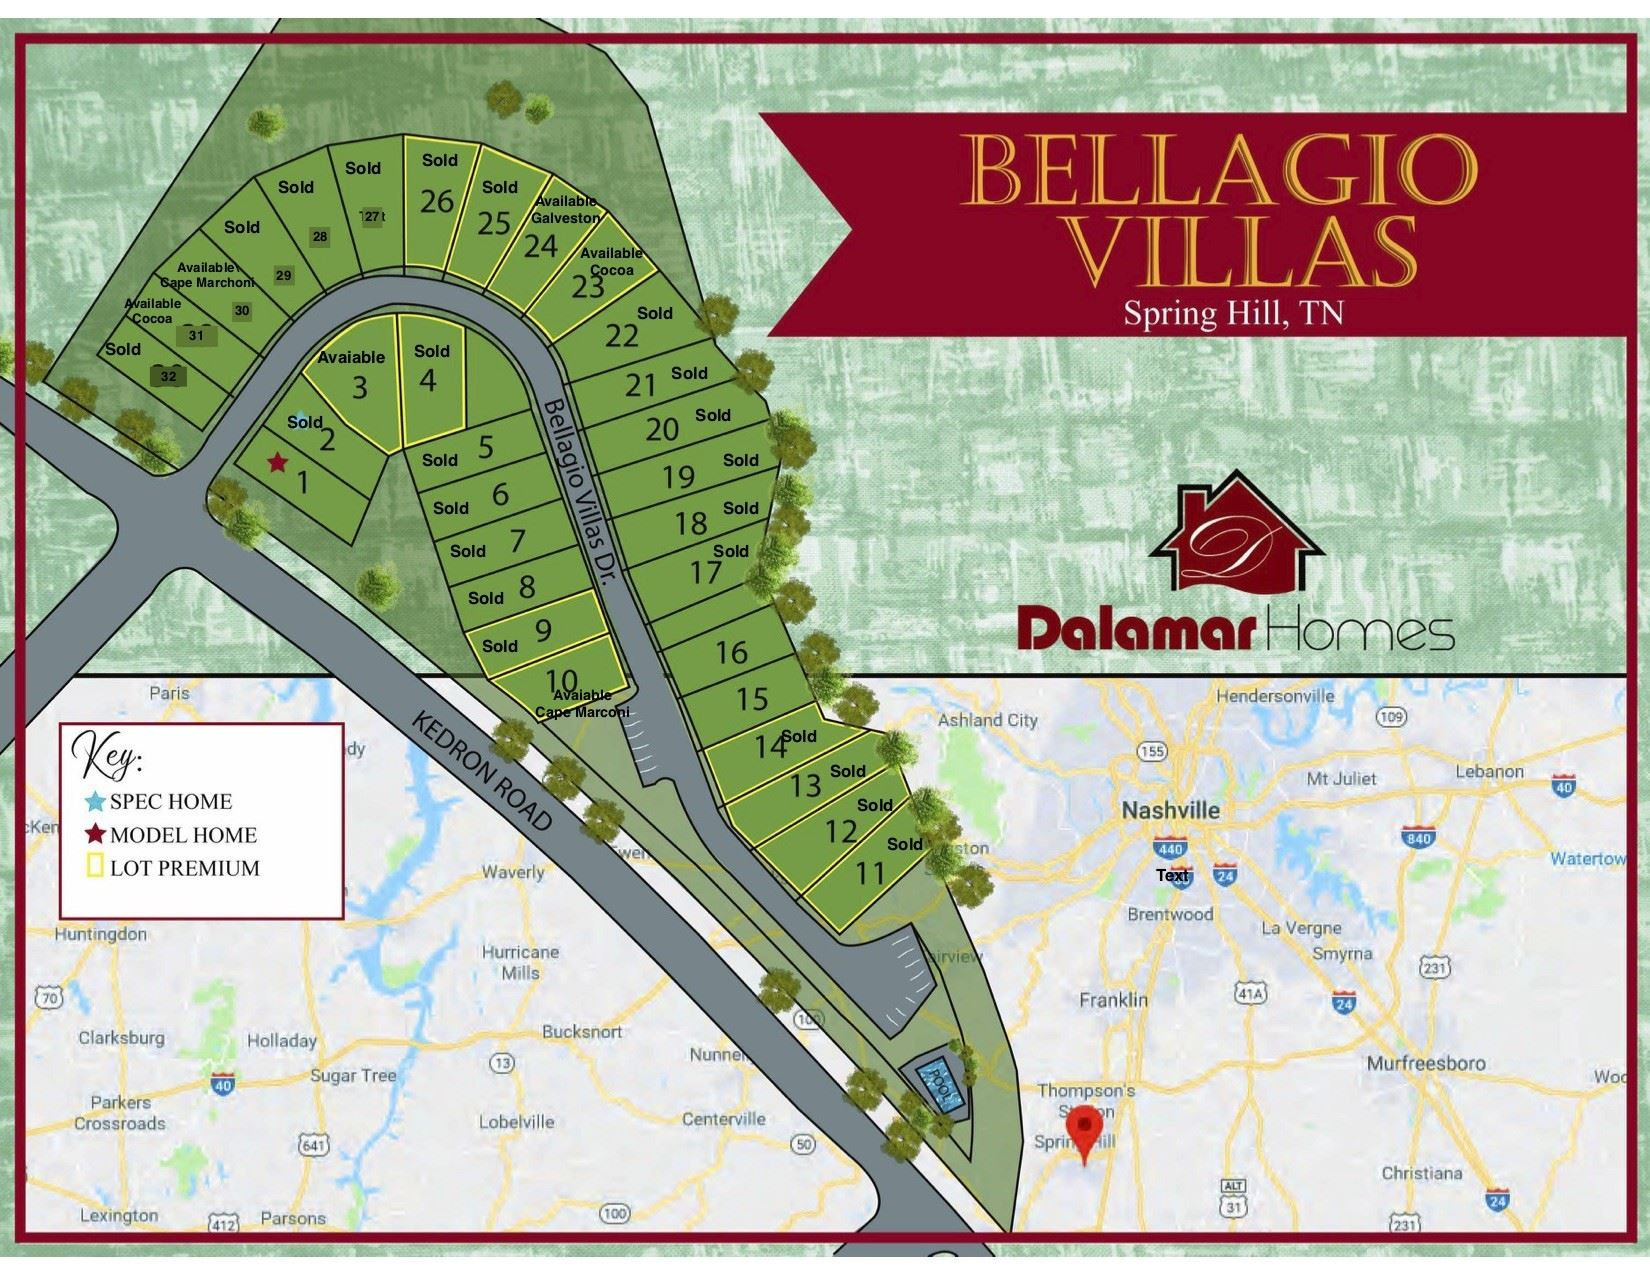 117 Bellagio Villas Drive, Spring Hill, TN 37174 - MLS#: 2220848